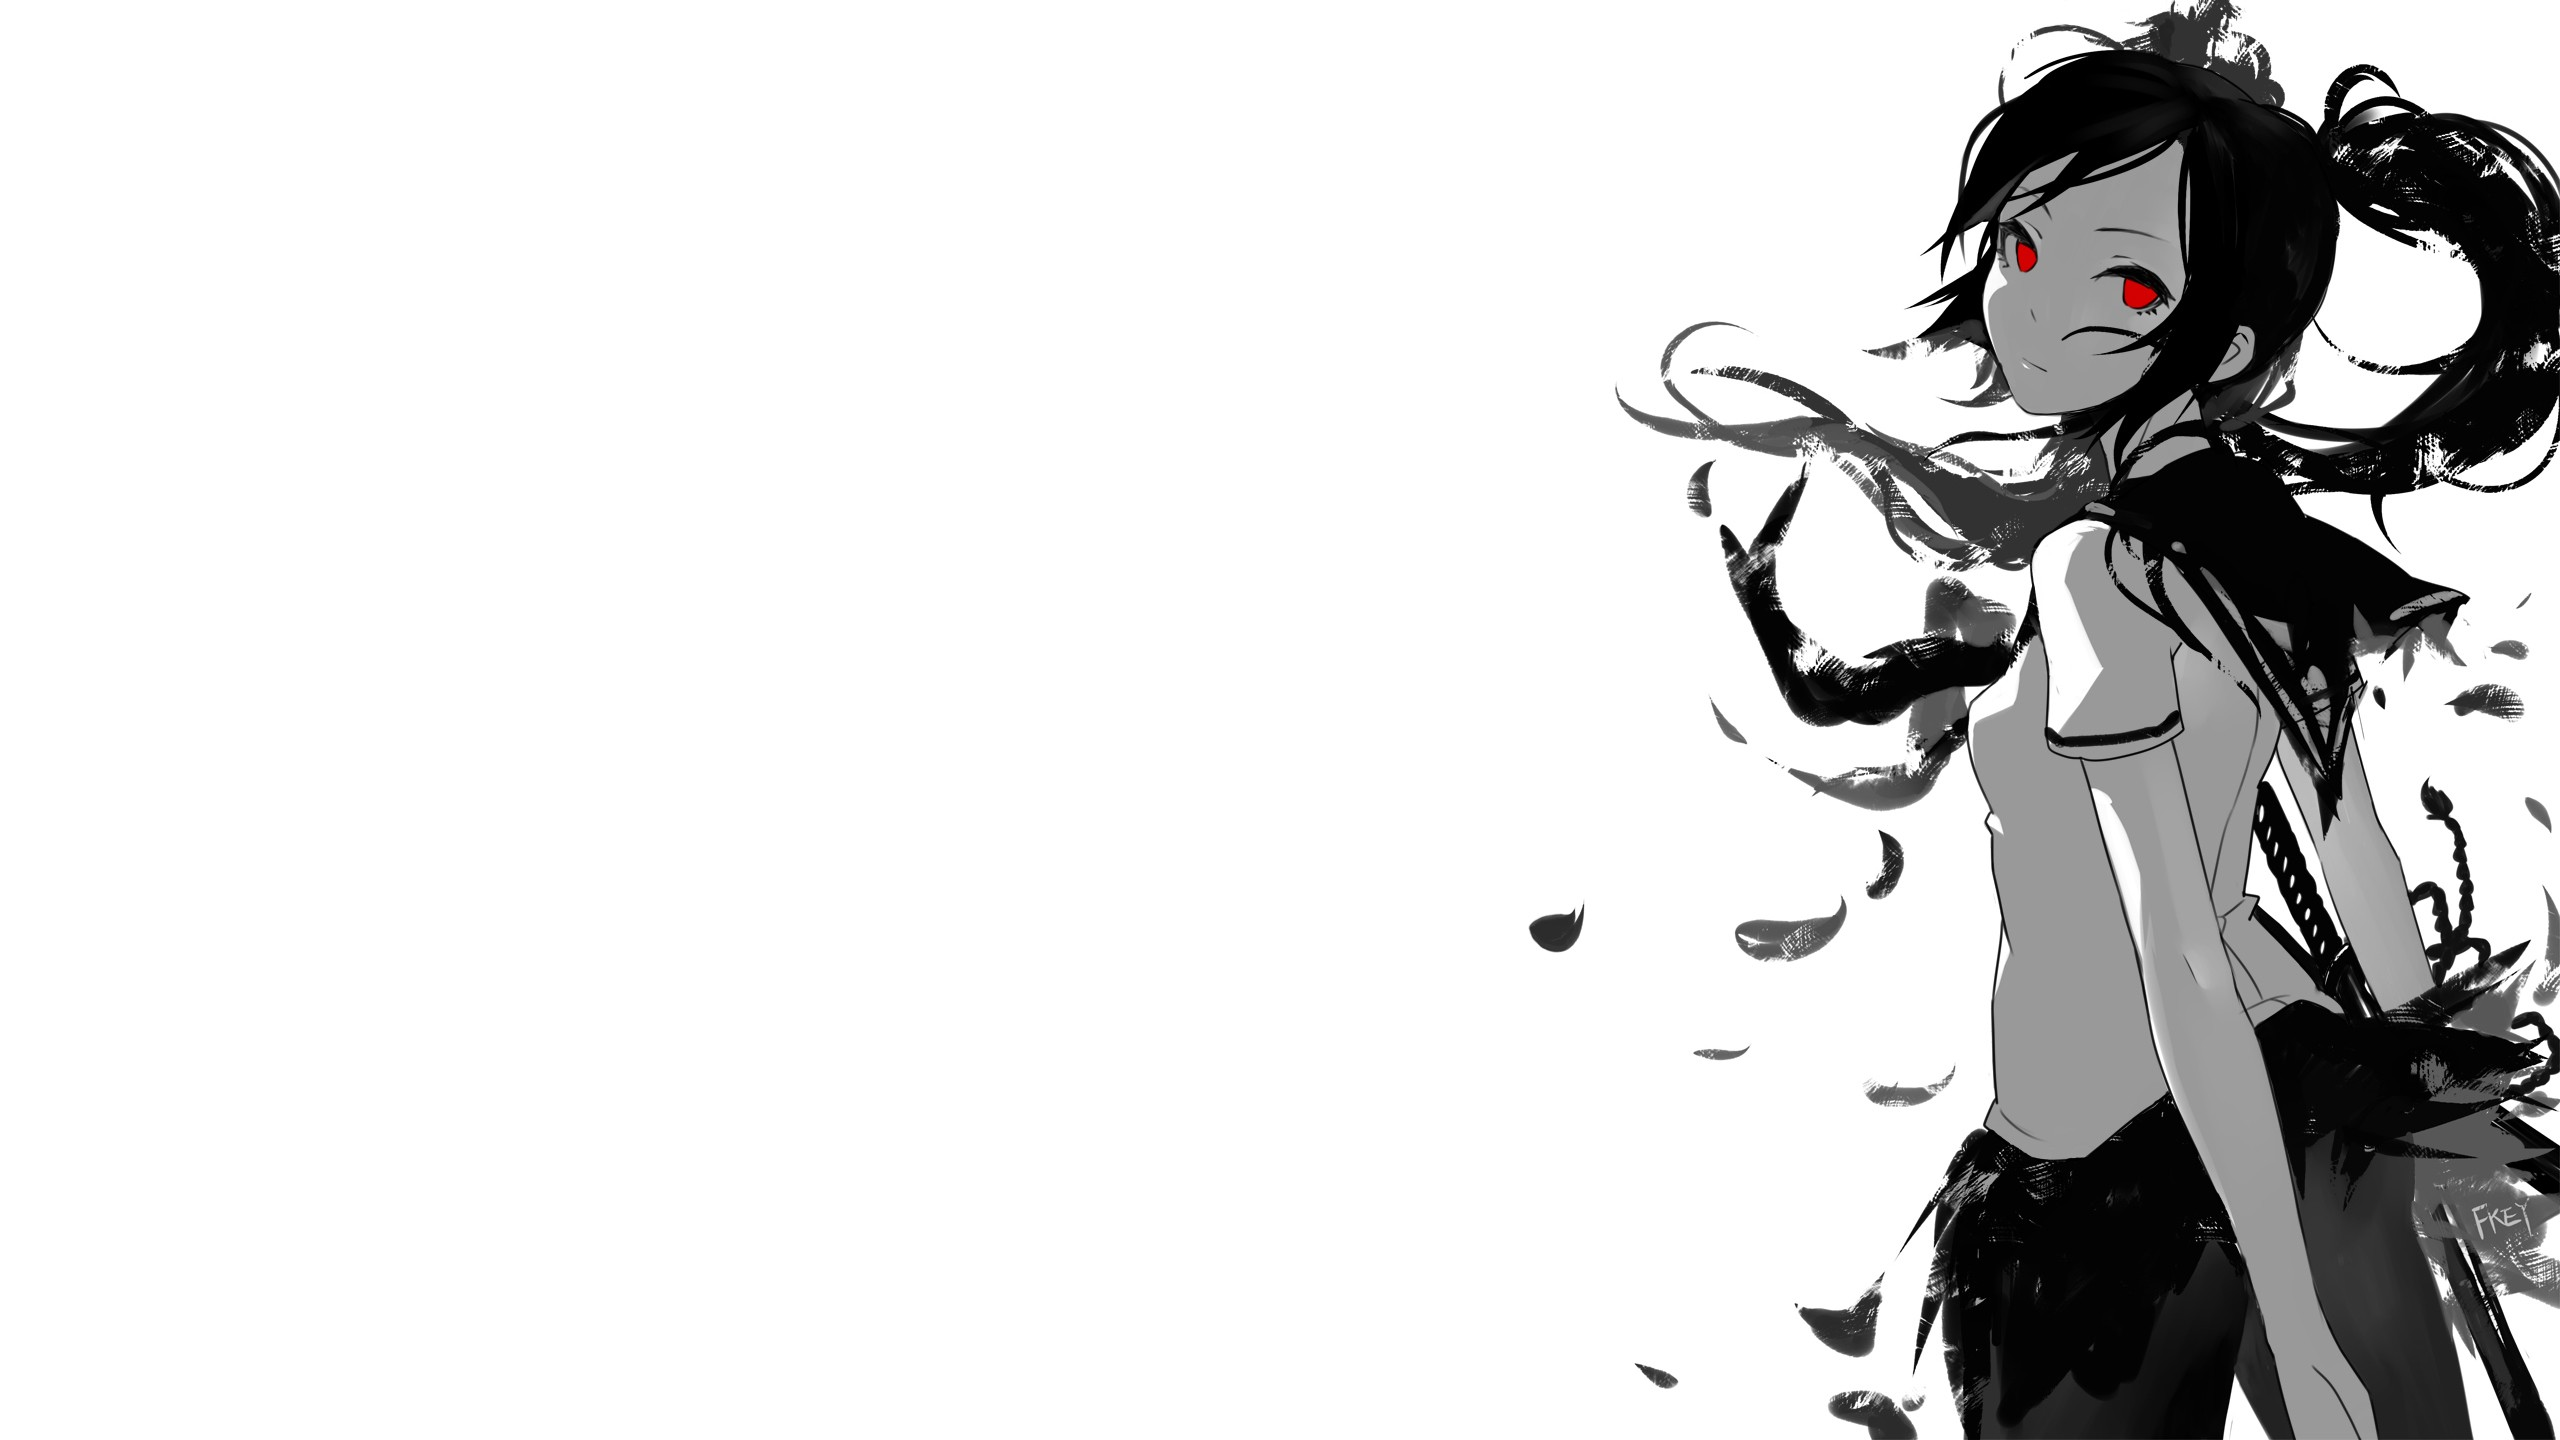 Anime Girls Black And White Fkey Grayscale Katana Lon